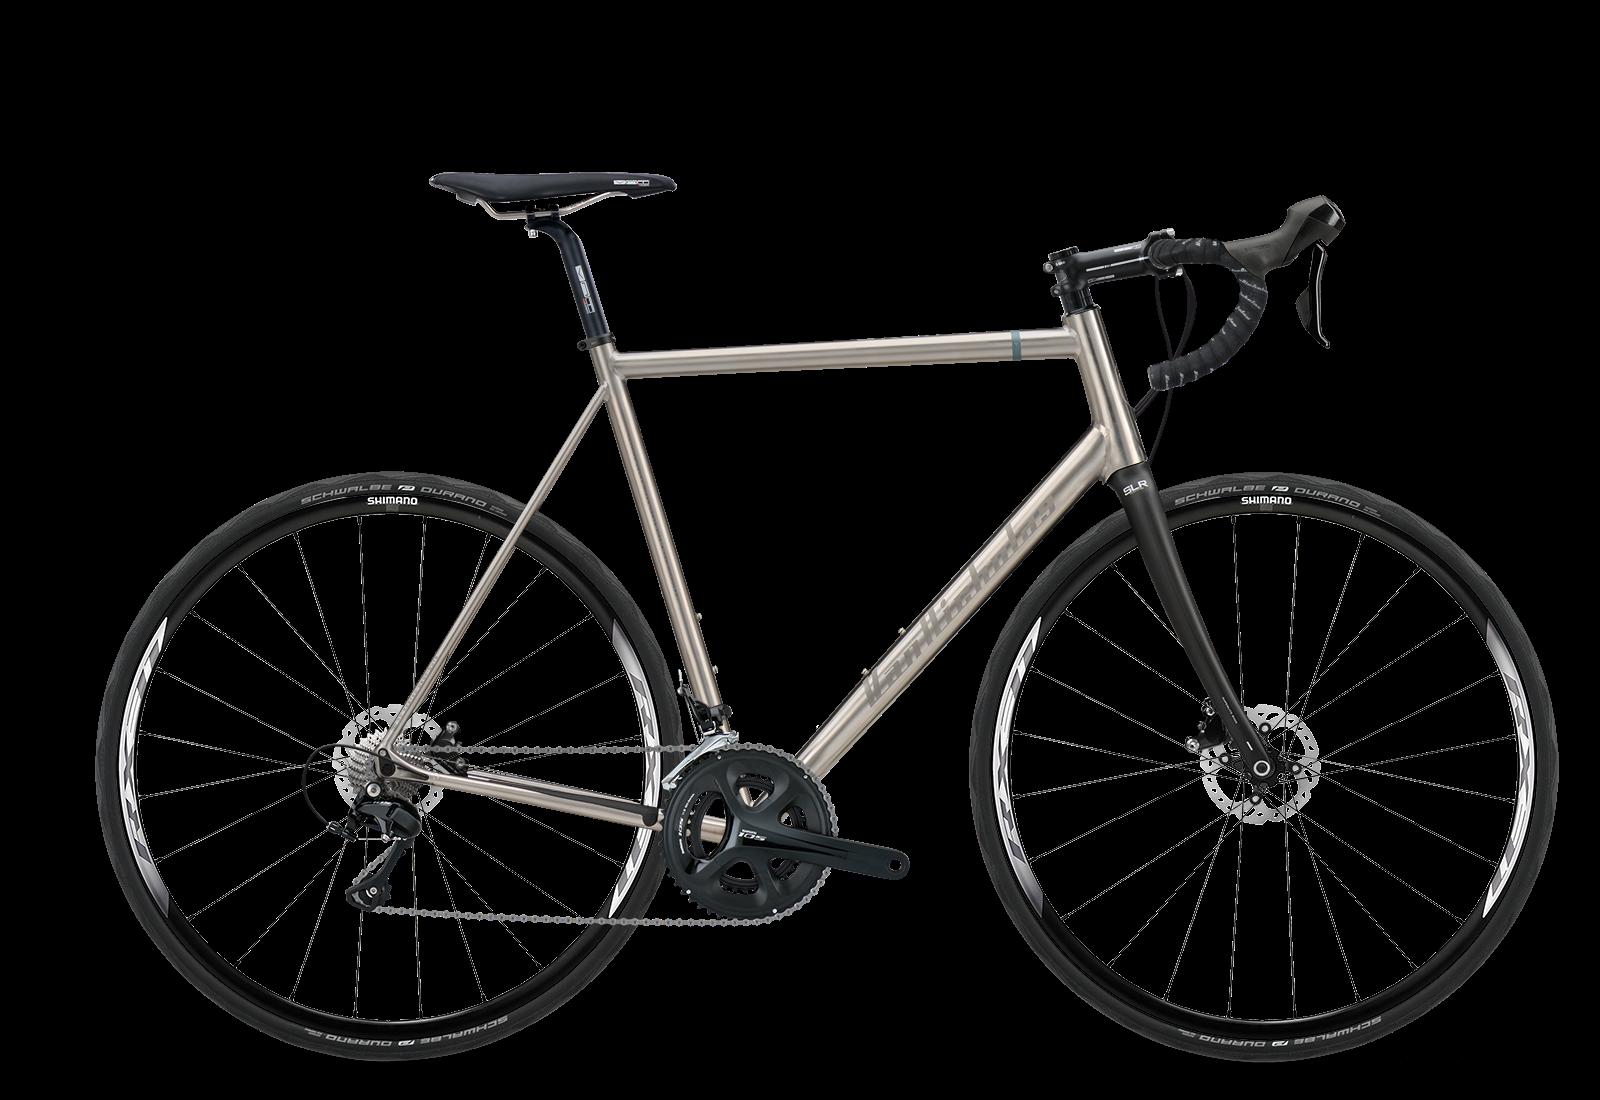 Van Nicholas Unveils The New Skeiron Titanium Road Bike